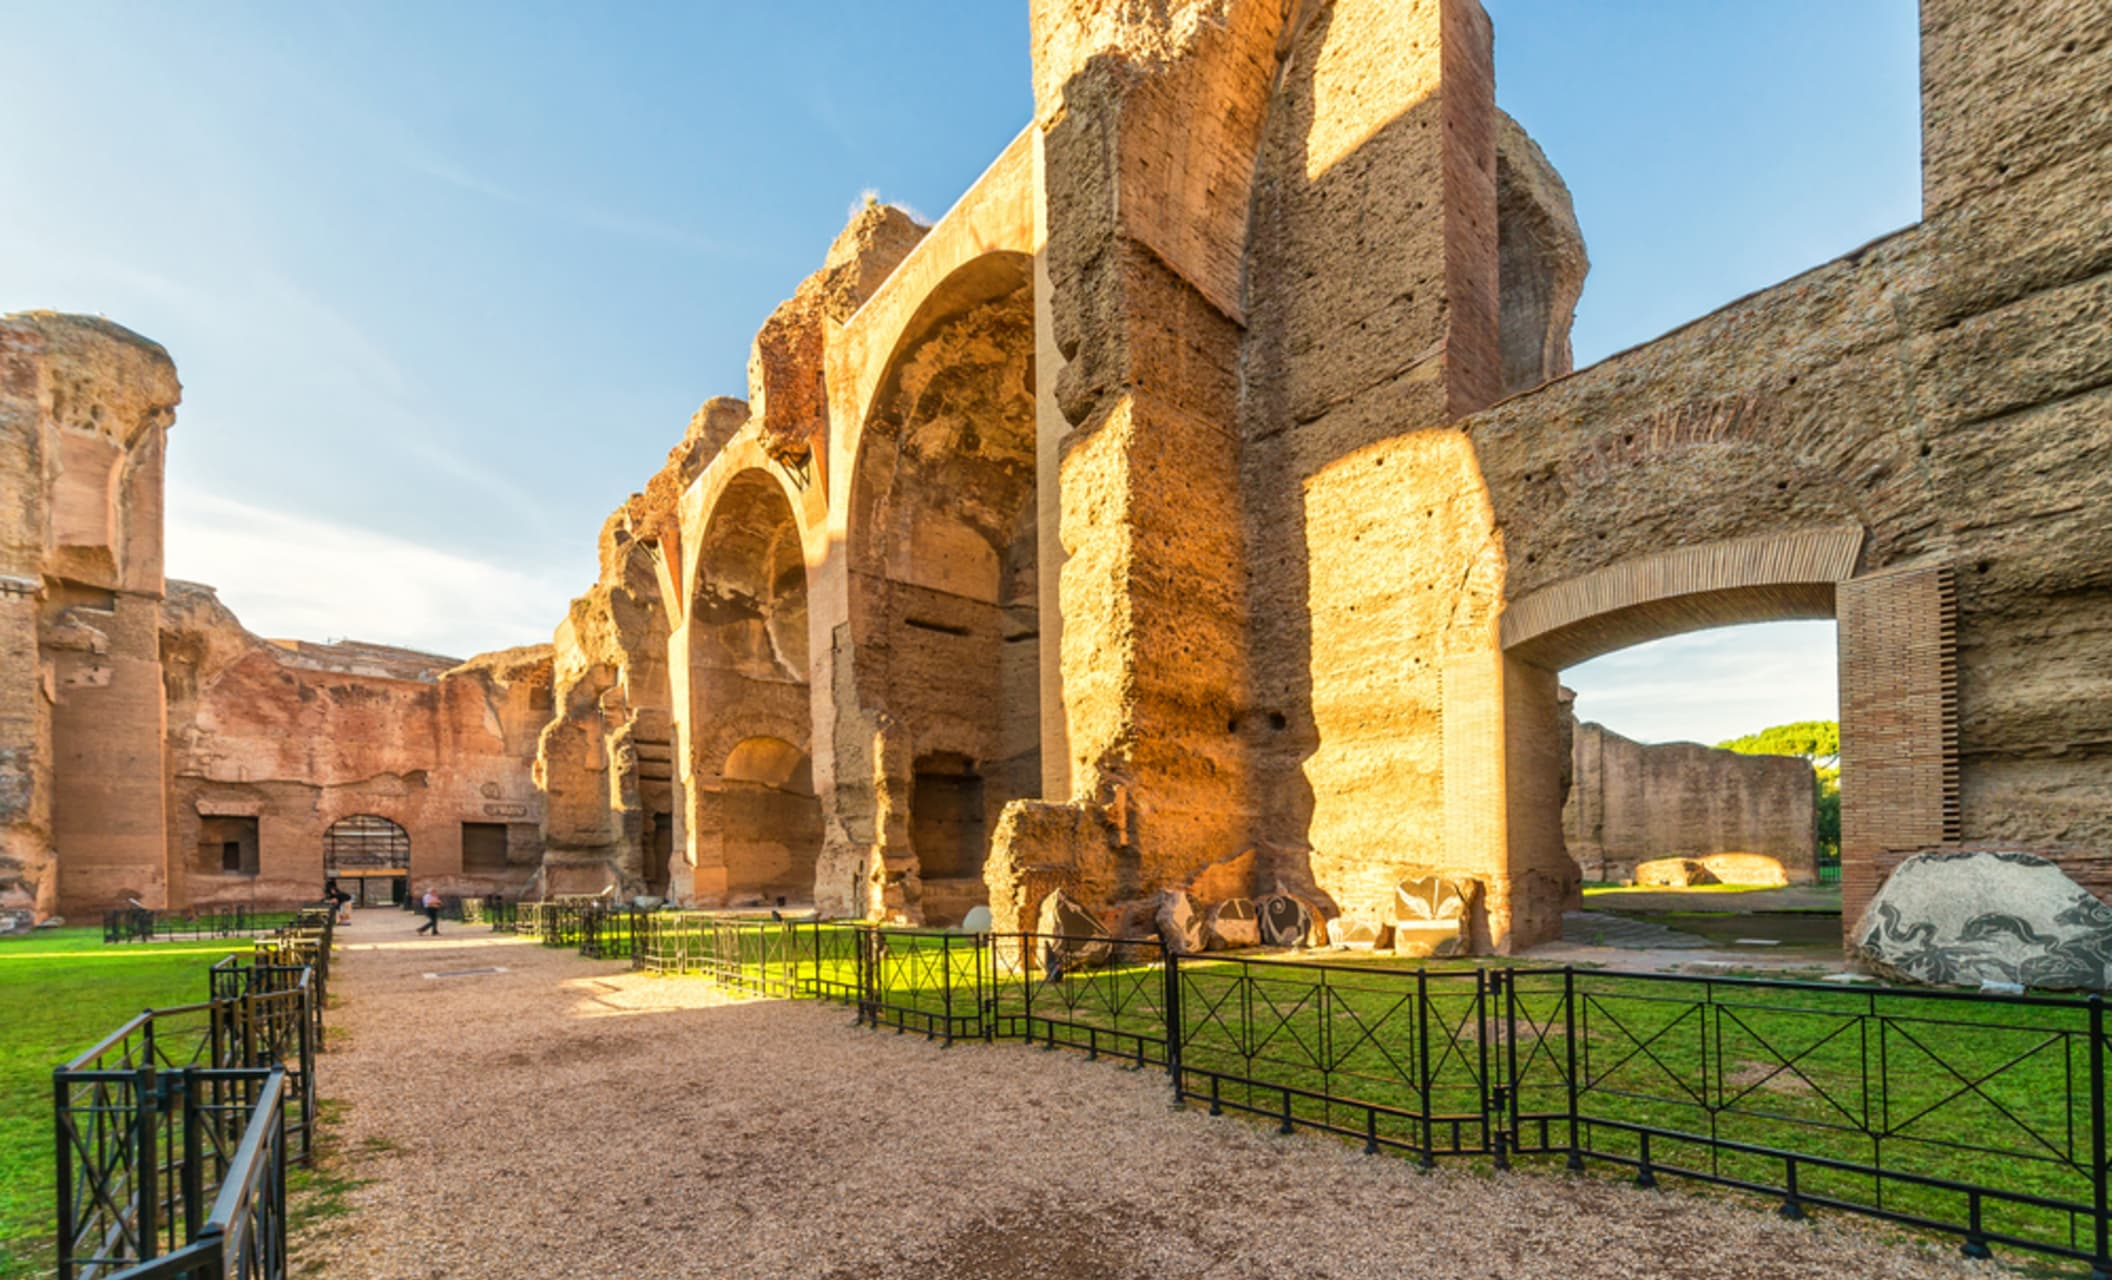 Rome - Caracalla's thermal baths